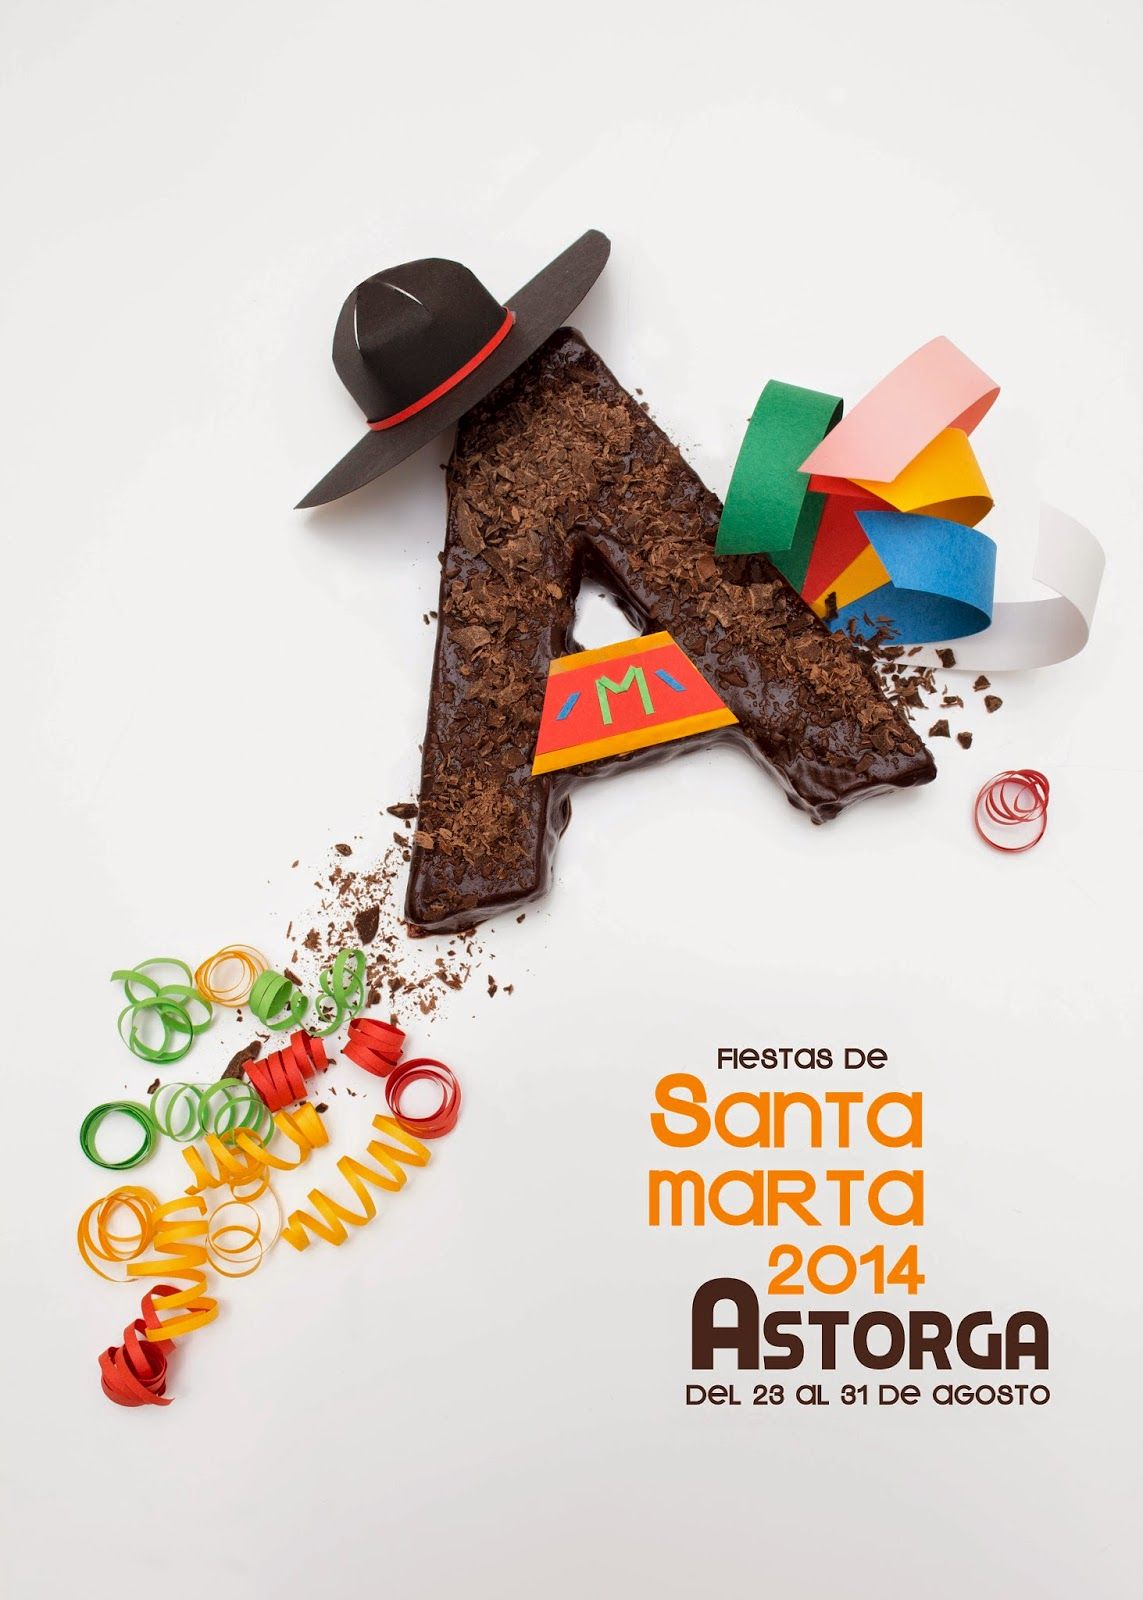 2014.  Fiestas de Santa Marta en Astorga.